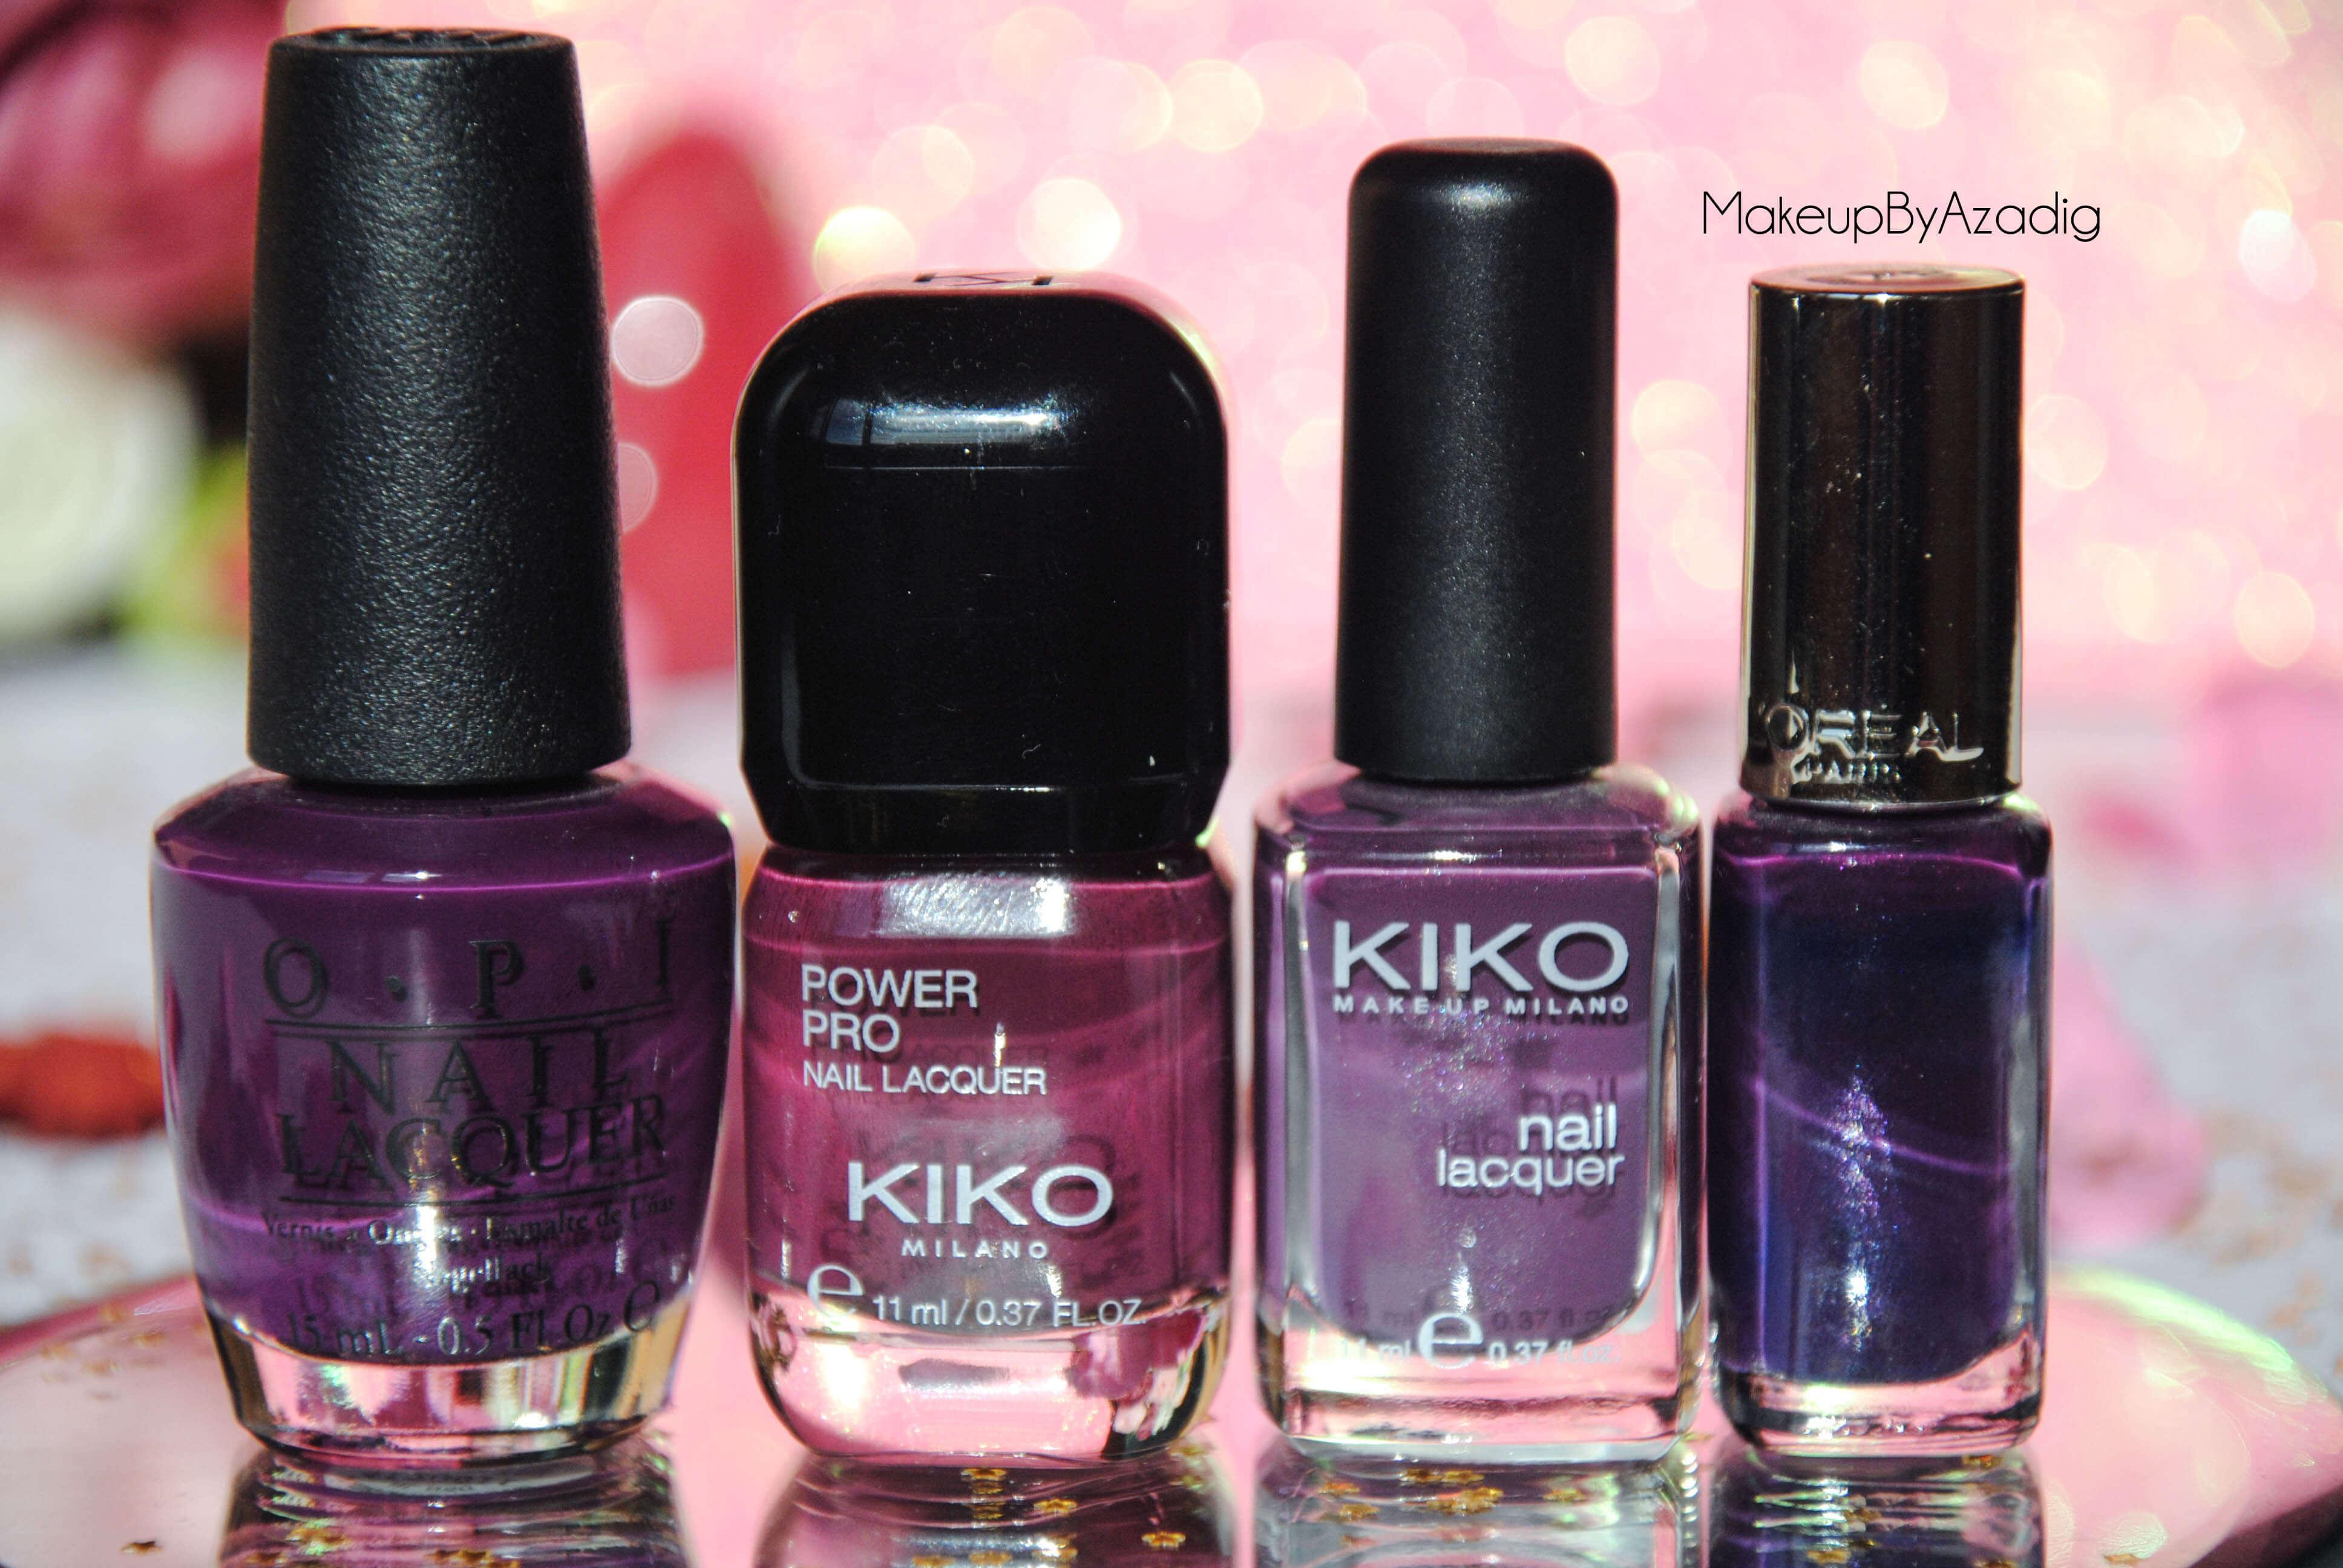 makeupbyazadig-vernis-tendance-automne-nails-autumn-formula-x-monop-makeup-troyes-dijon-paris-sandrea26france-camaieu-opi-kiko-sephora-mavala-essie-purple